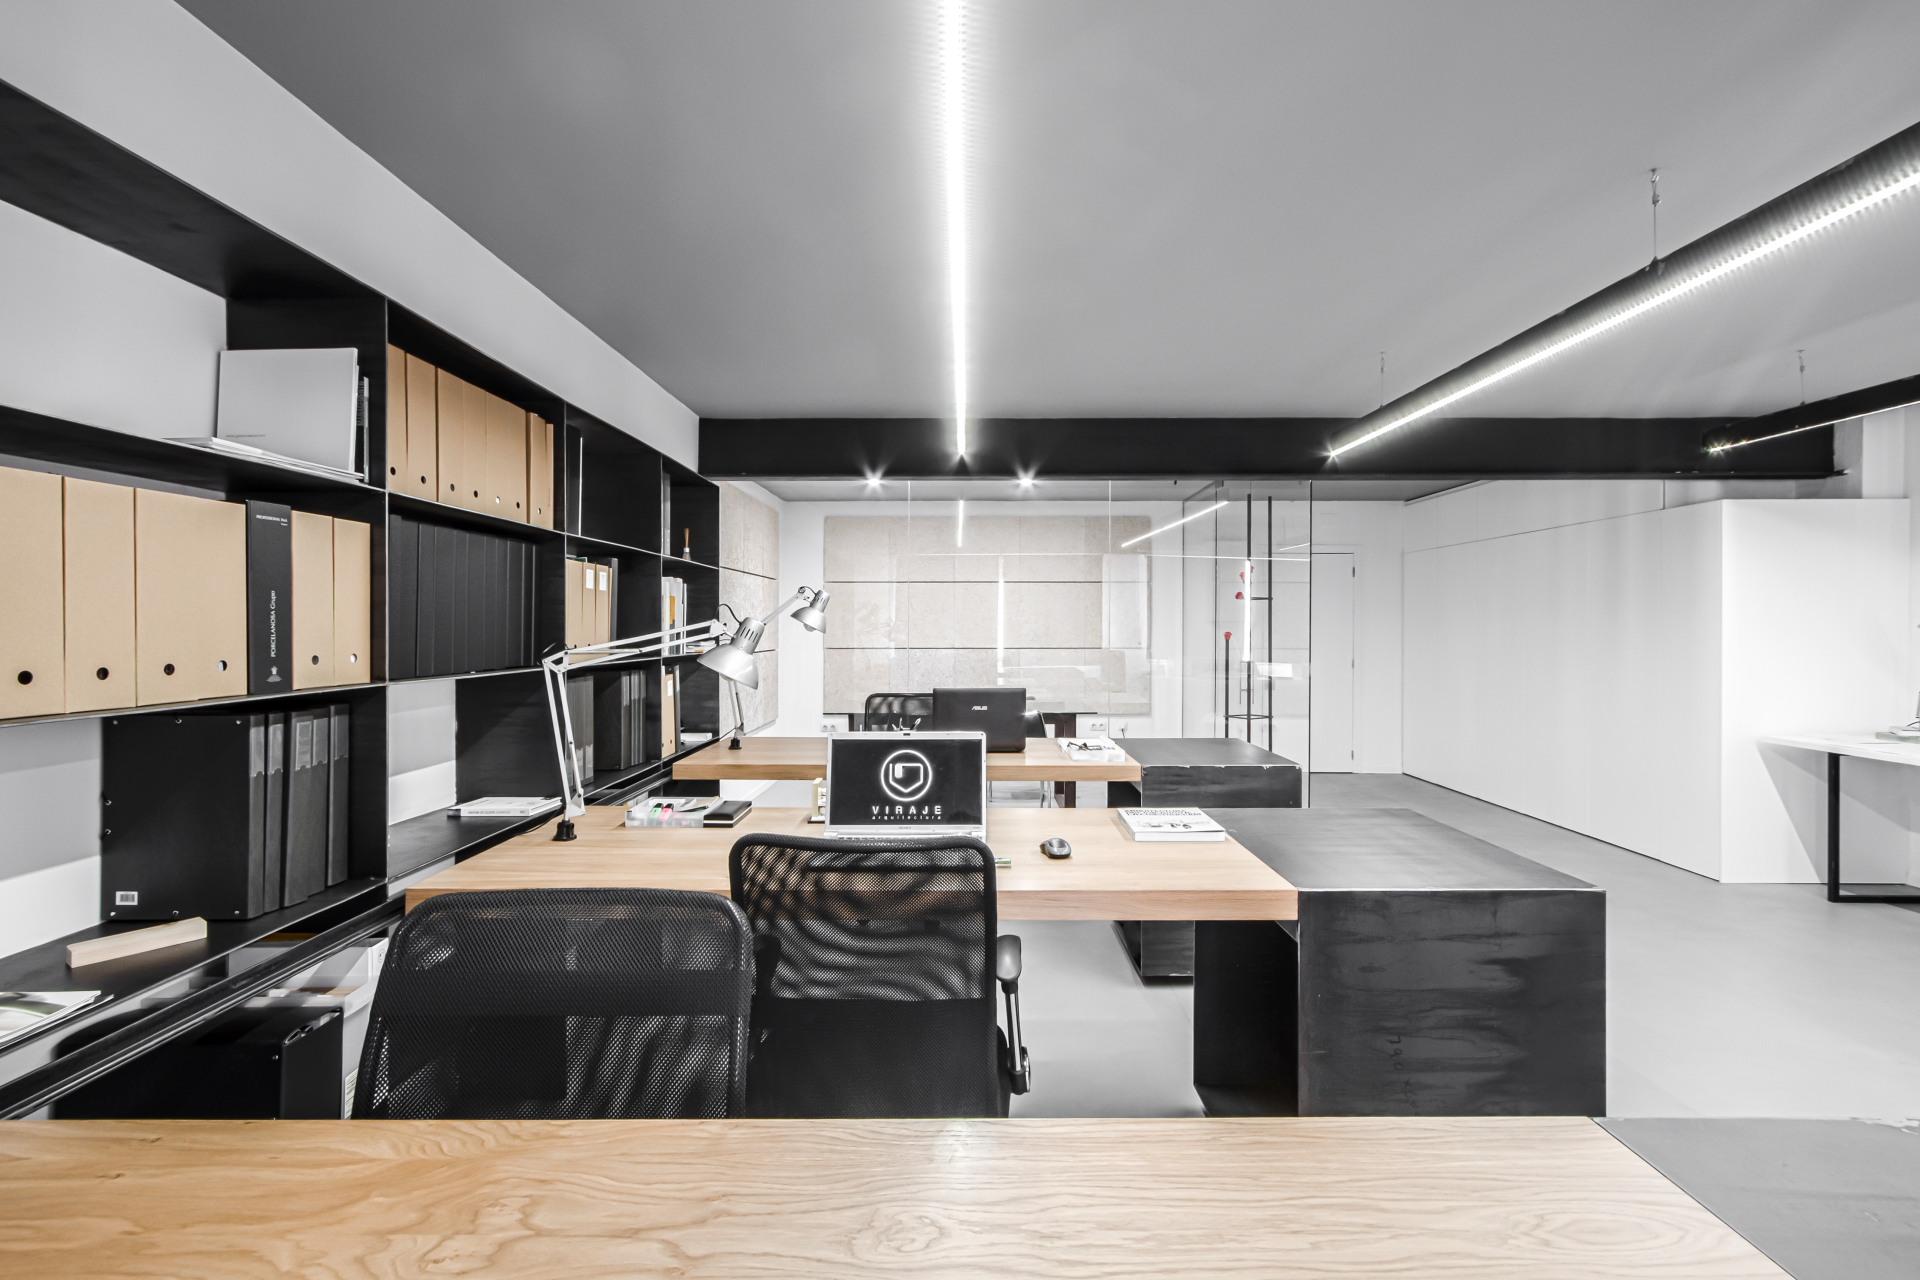 fotografia-arquitectura-valencia-german-cabo-viraje-estudio (1)